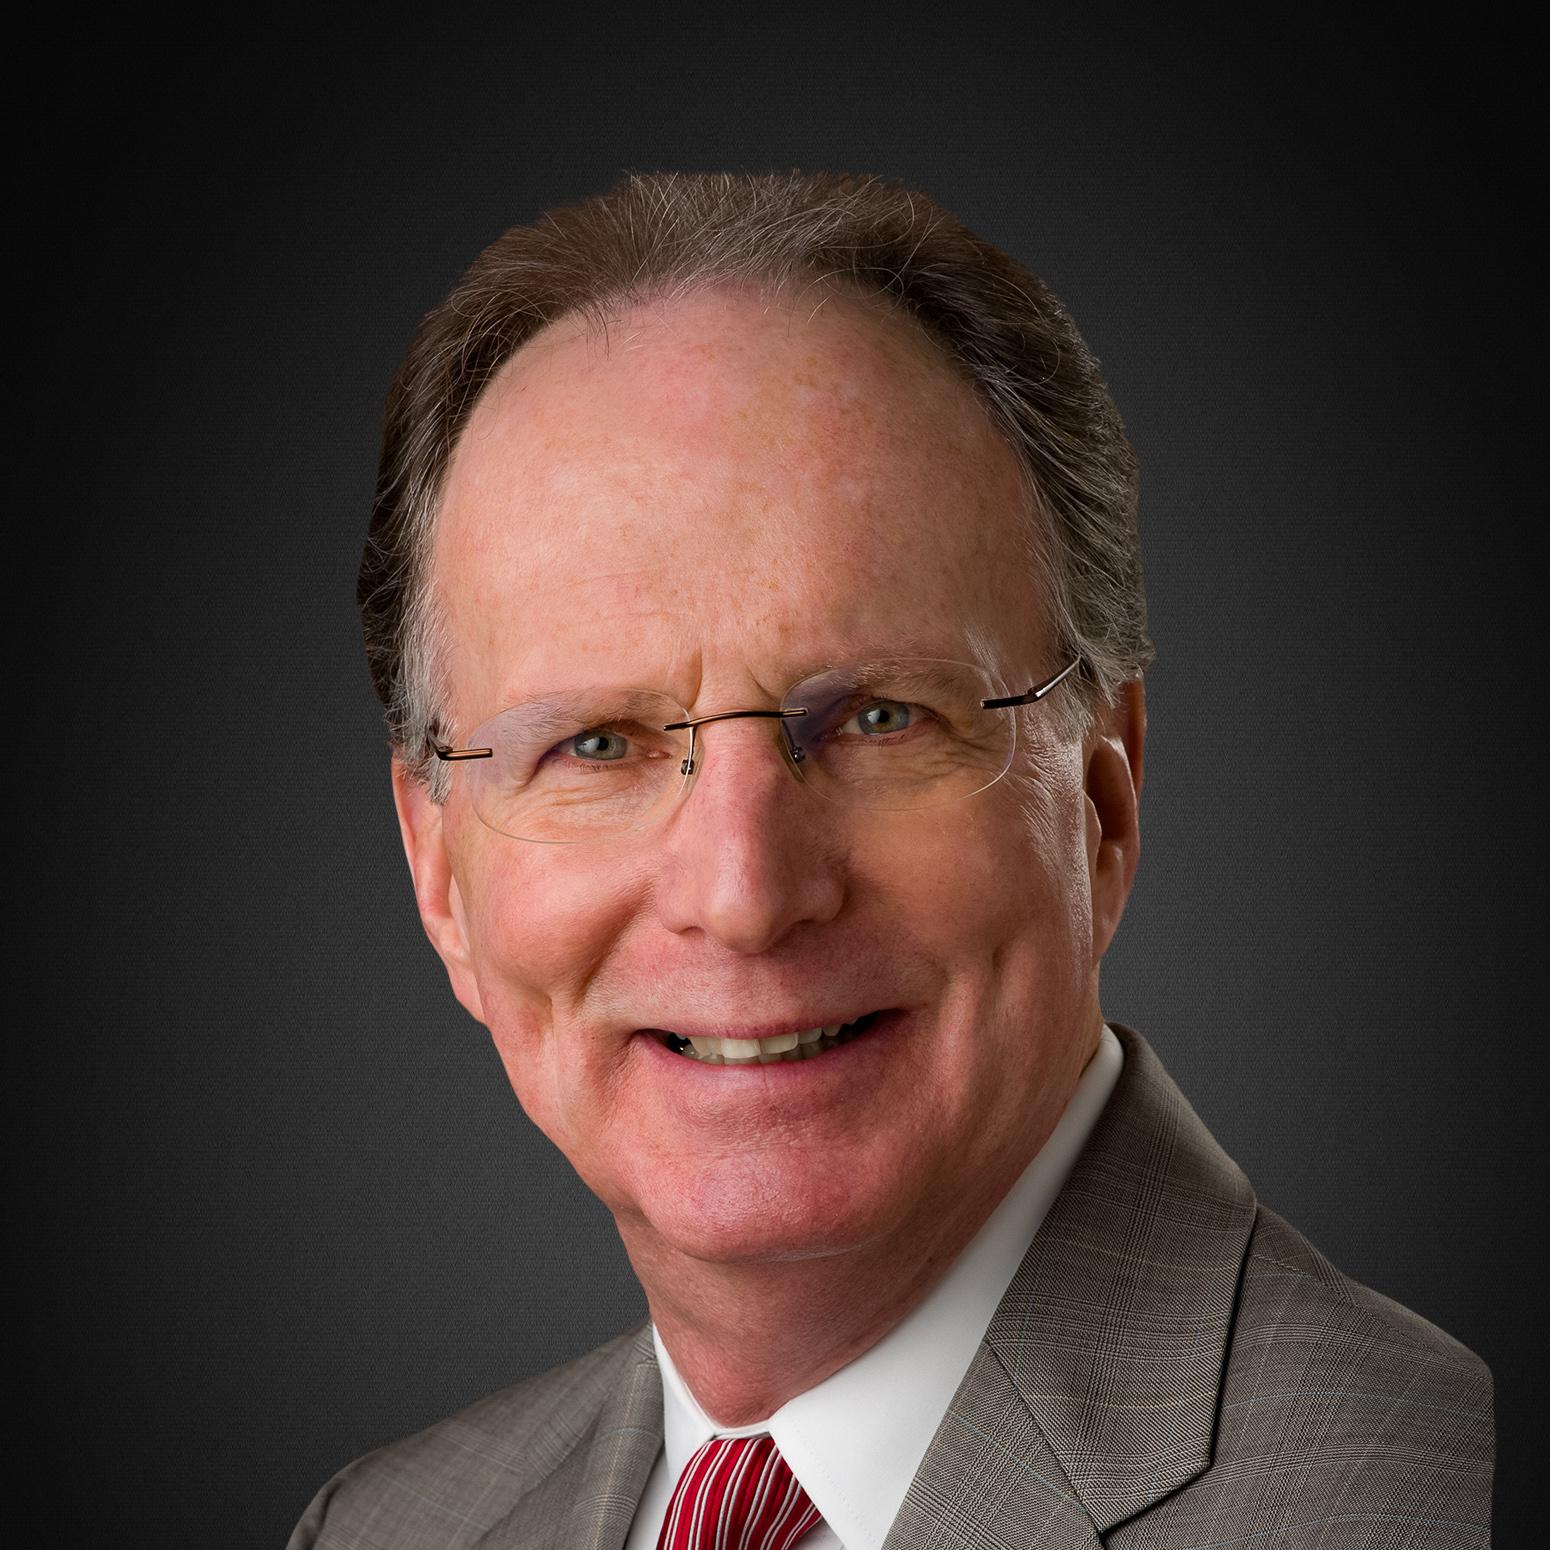 Dr. Kevin P. Reilly Senior Advisor, Education